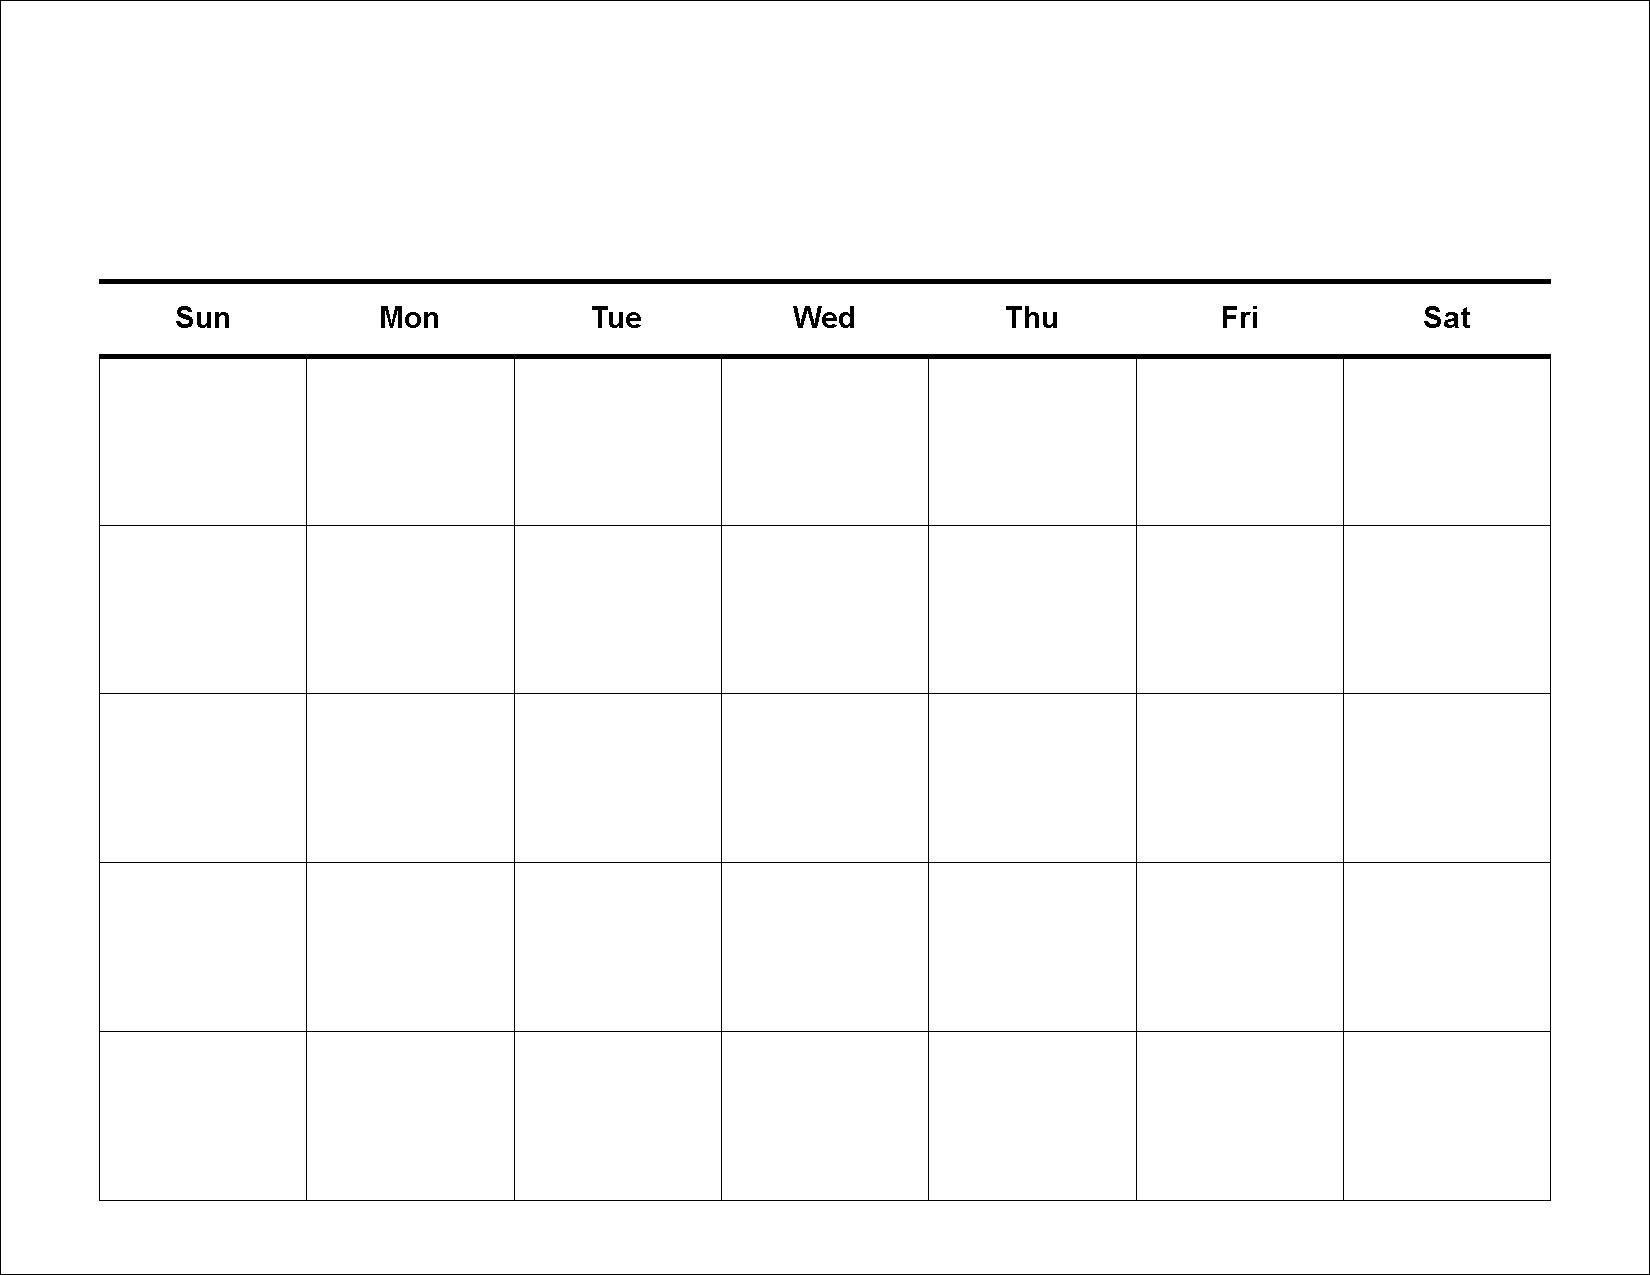 Printable 5 Day Monthly Calendar • Printable Blank Calendar Template for Printable 5 Day Monthly Calendar